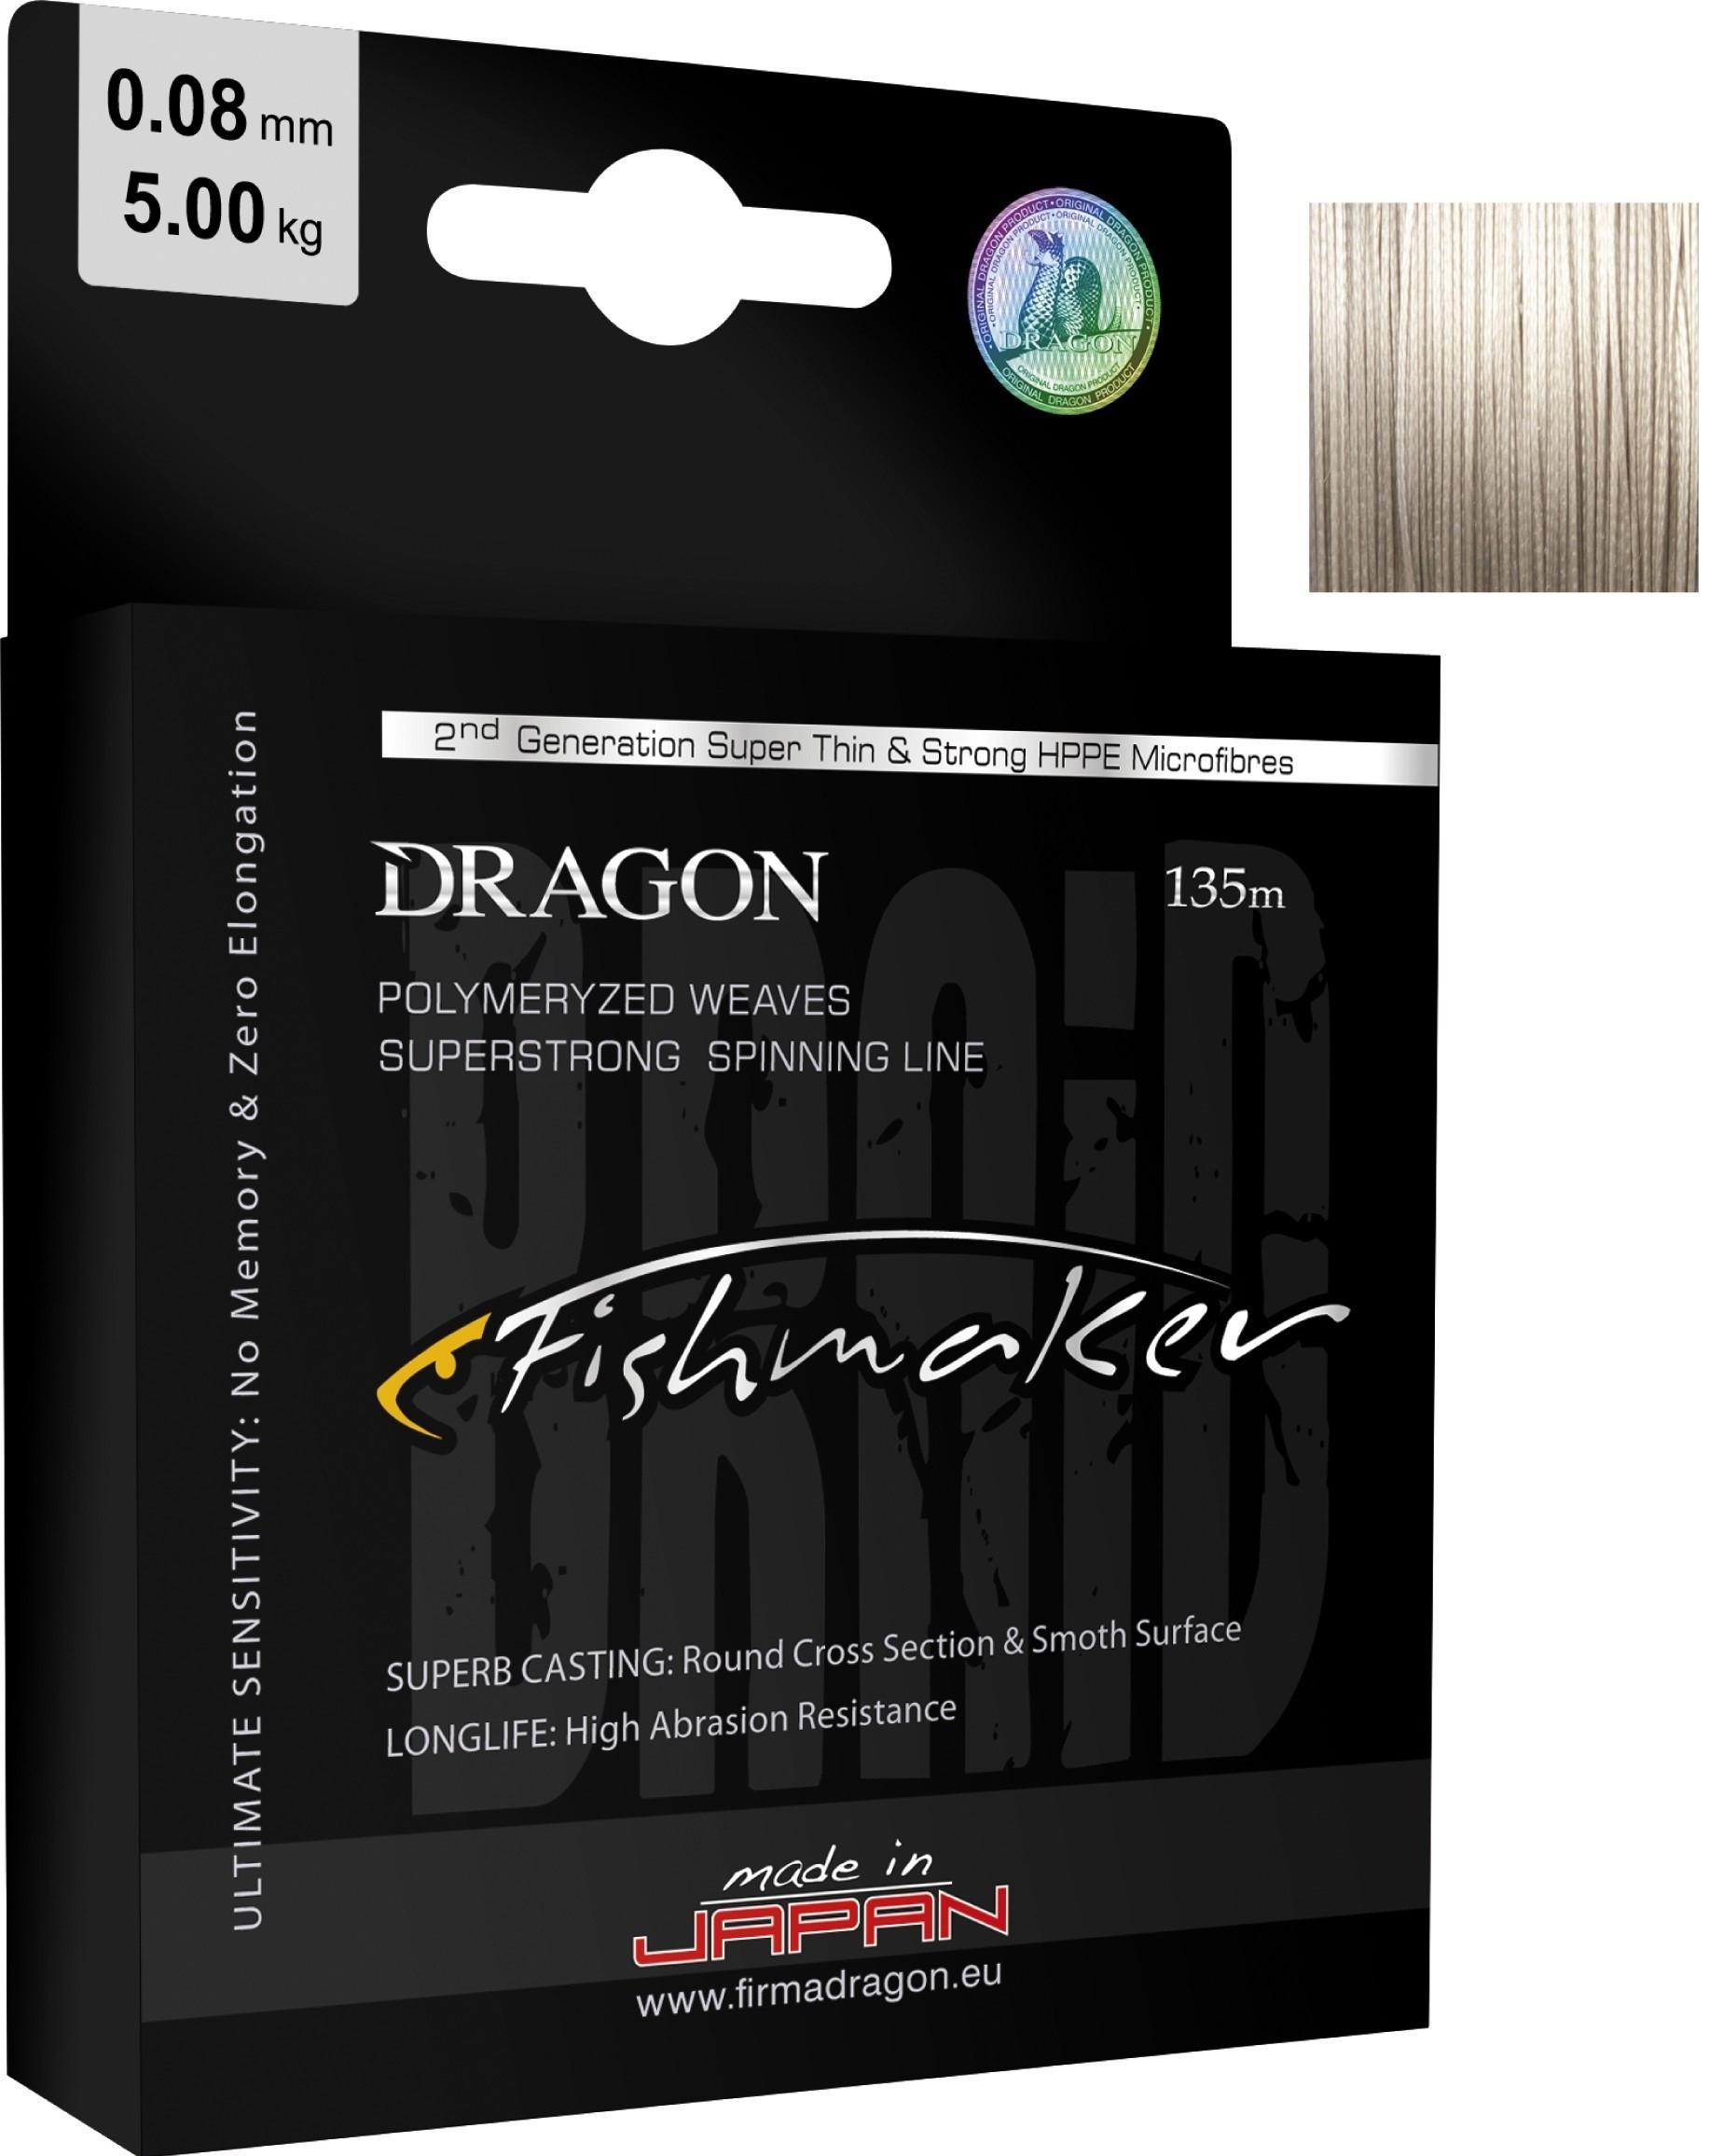 Valas pintas Dragon FISHMAKER 135m